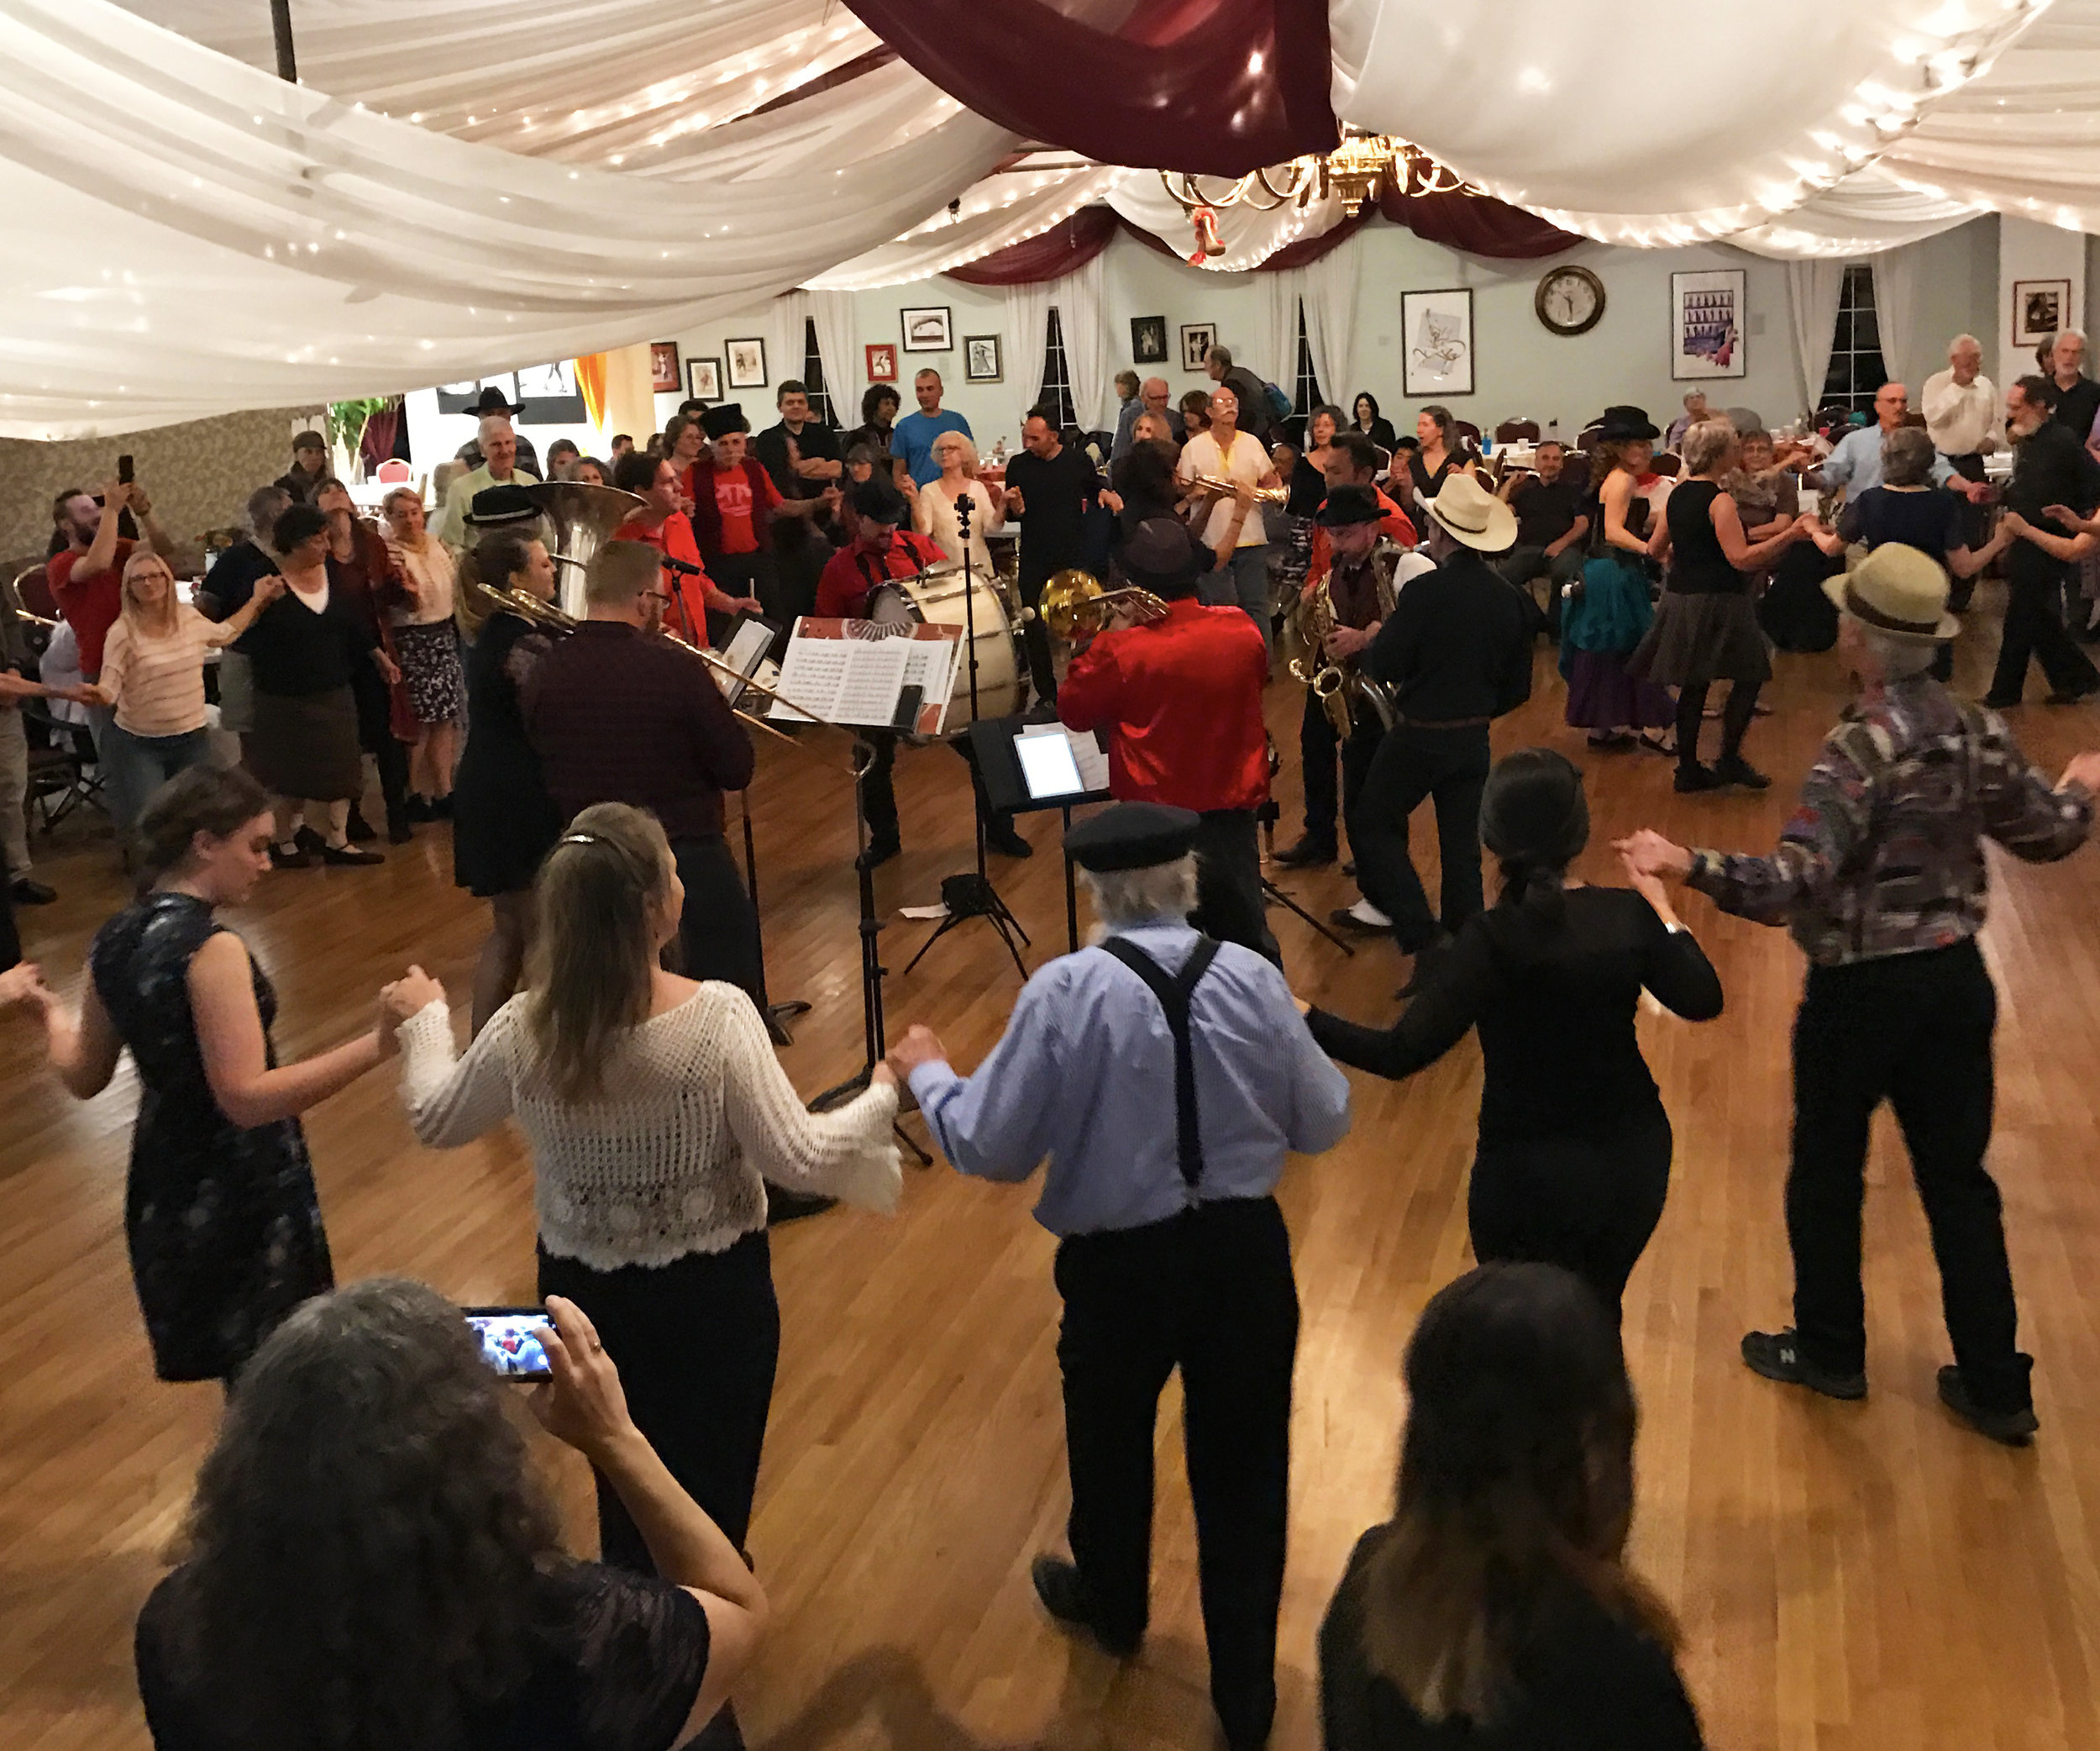 Boulder Balkan Bash 2016: Gora Gora Orkestar and dancers